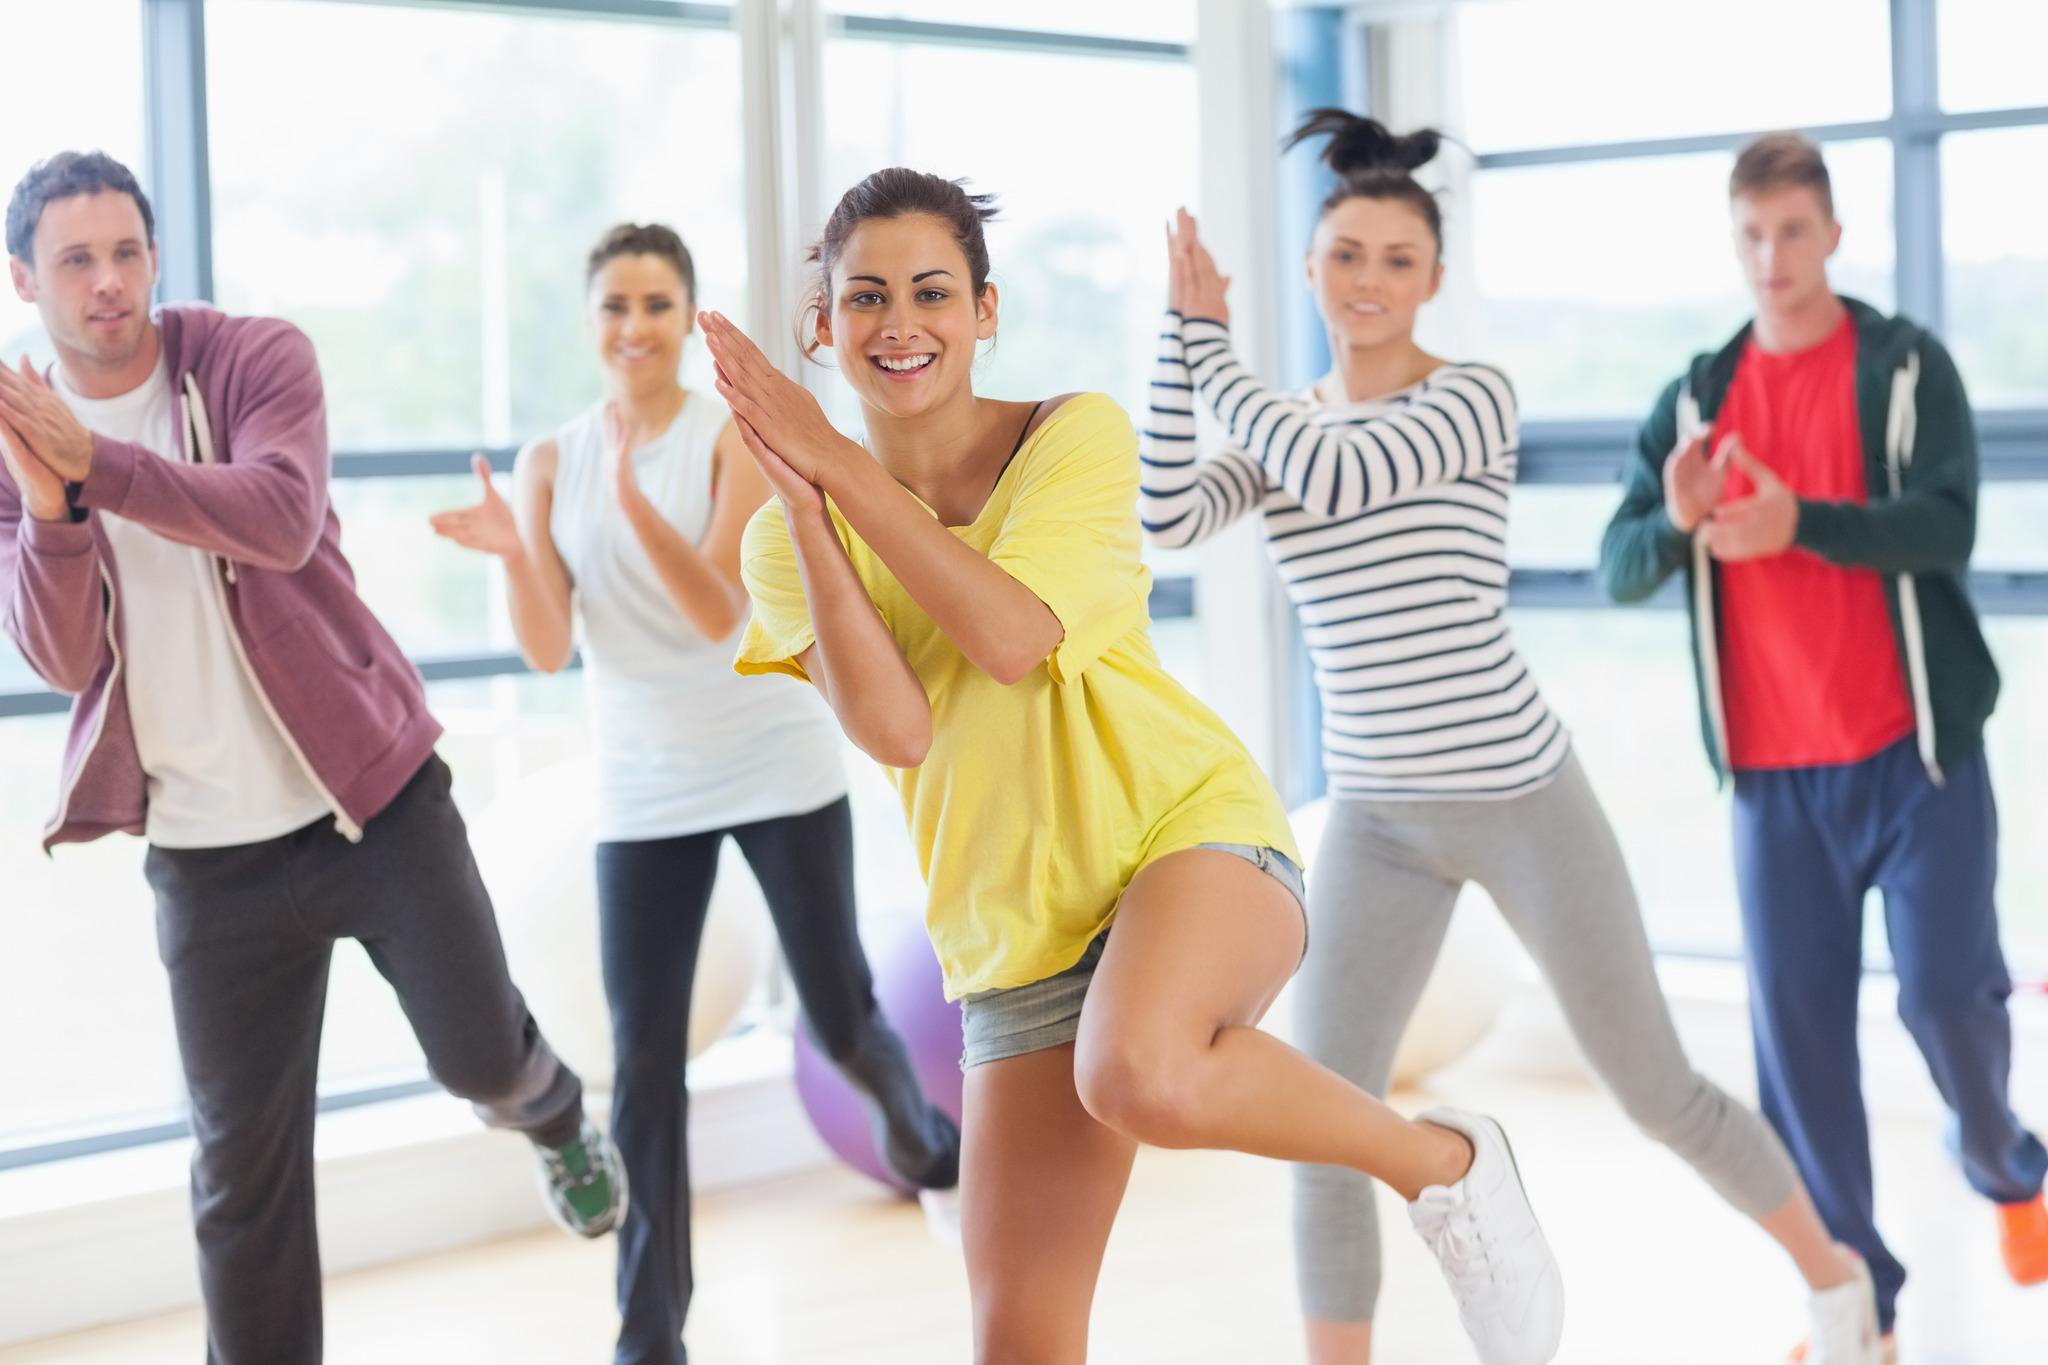 NÖ Gebietskrankenkasse: Pilates und Piloxing®-Training